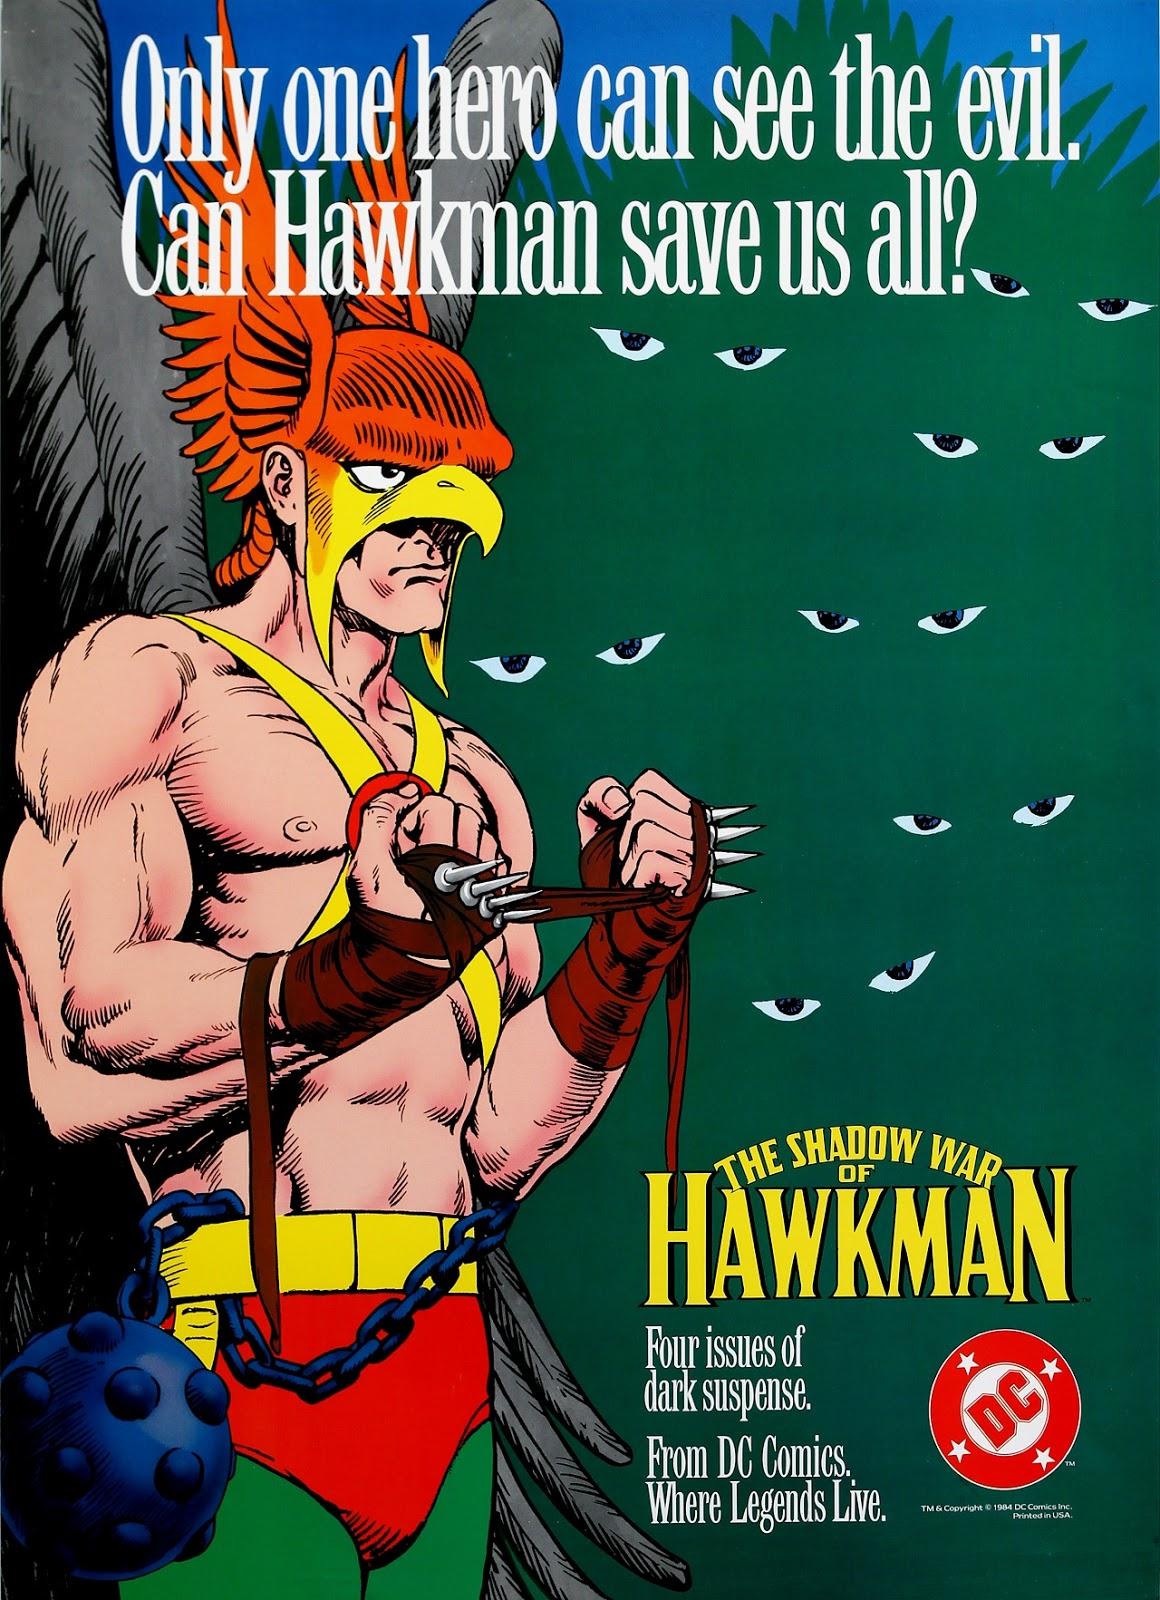 The_Shadow_War_of_Hawkman house ad